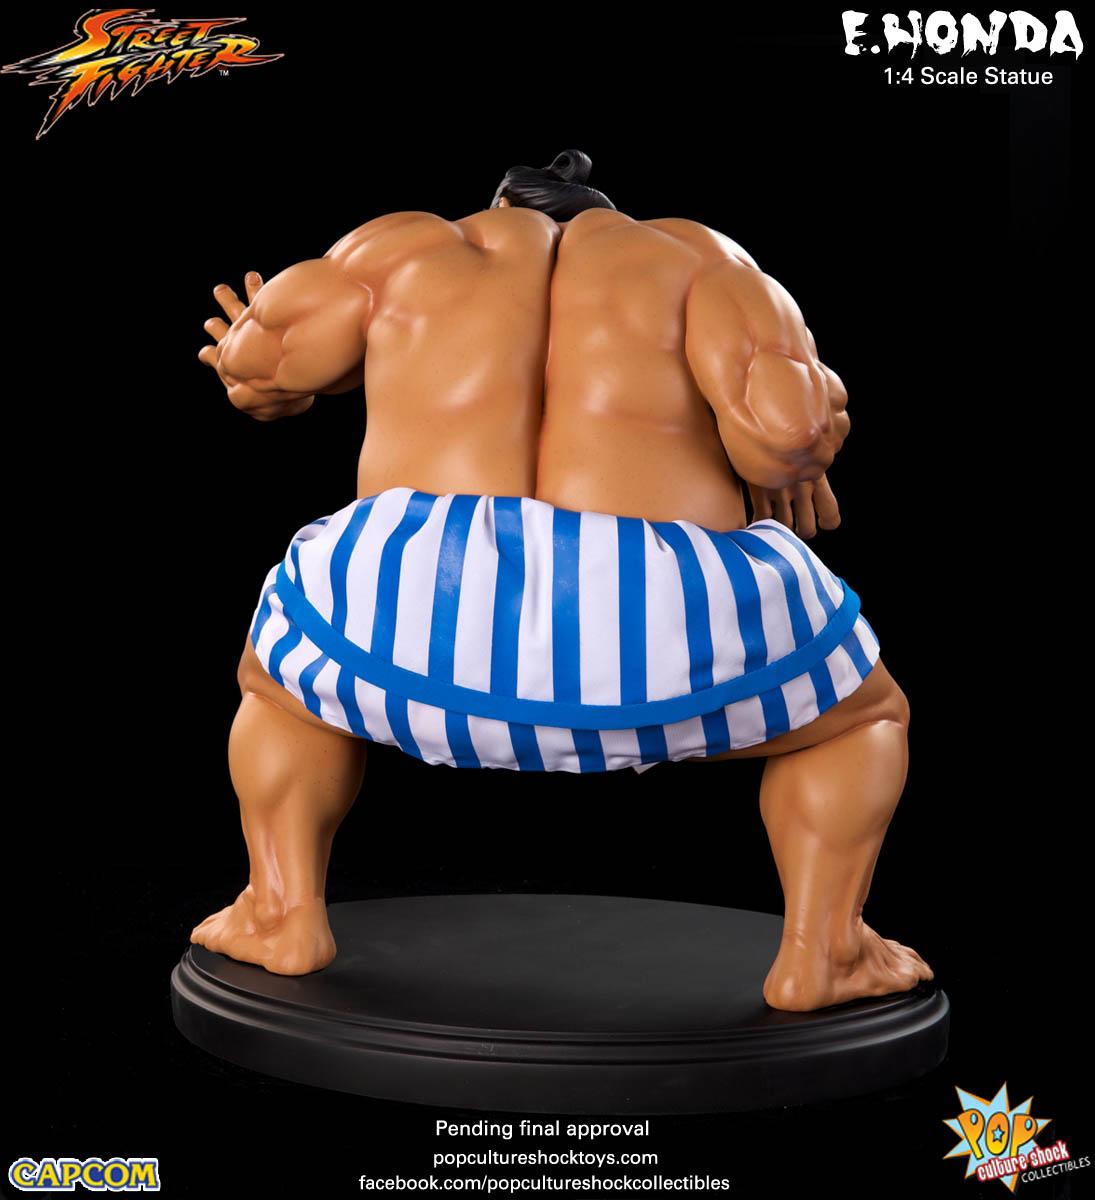 [Pop Culture Shock] Street Fighter: E. Honda 1/4 Statue - Página 3 Street-Fighter-E.-Honda-Regular-Statue-007